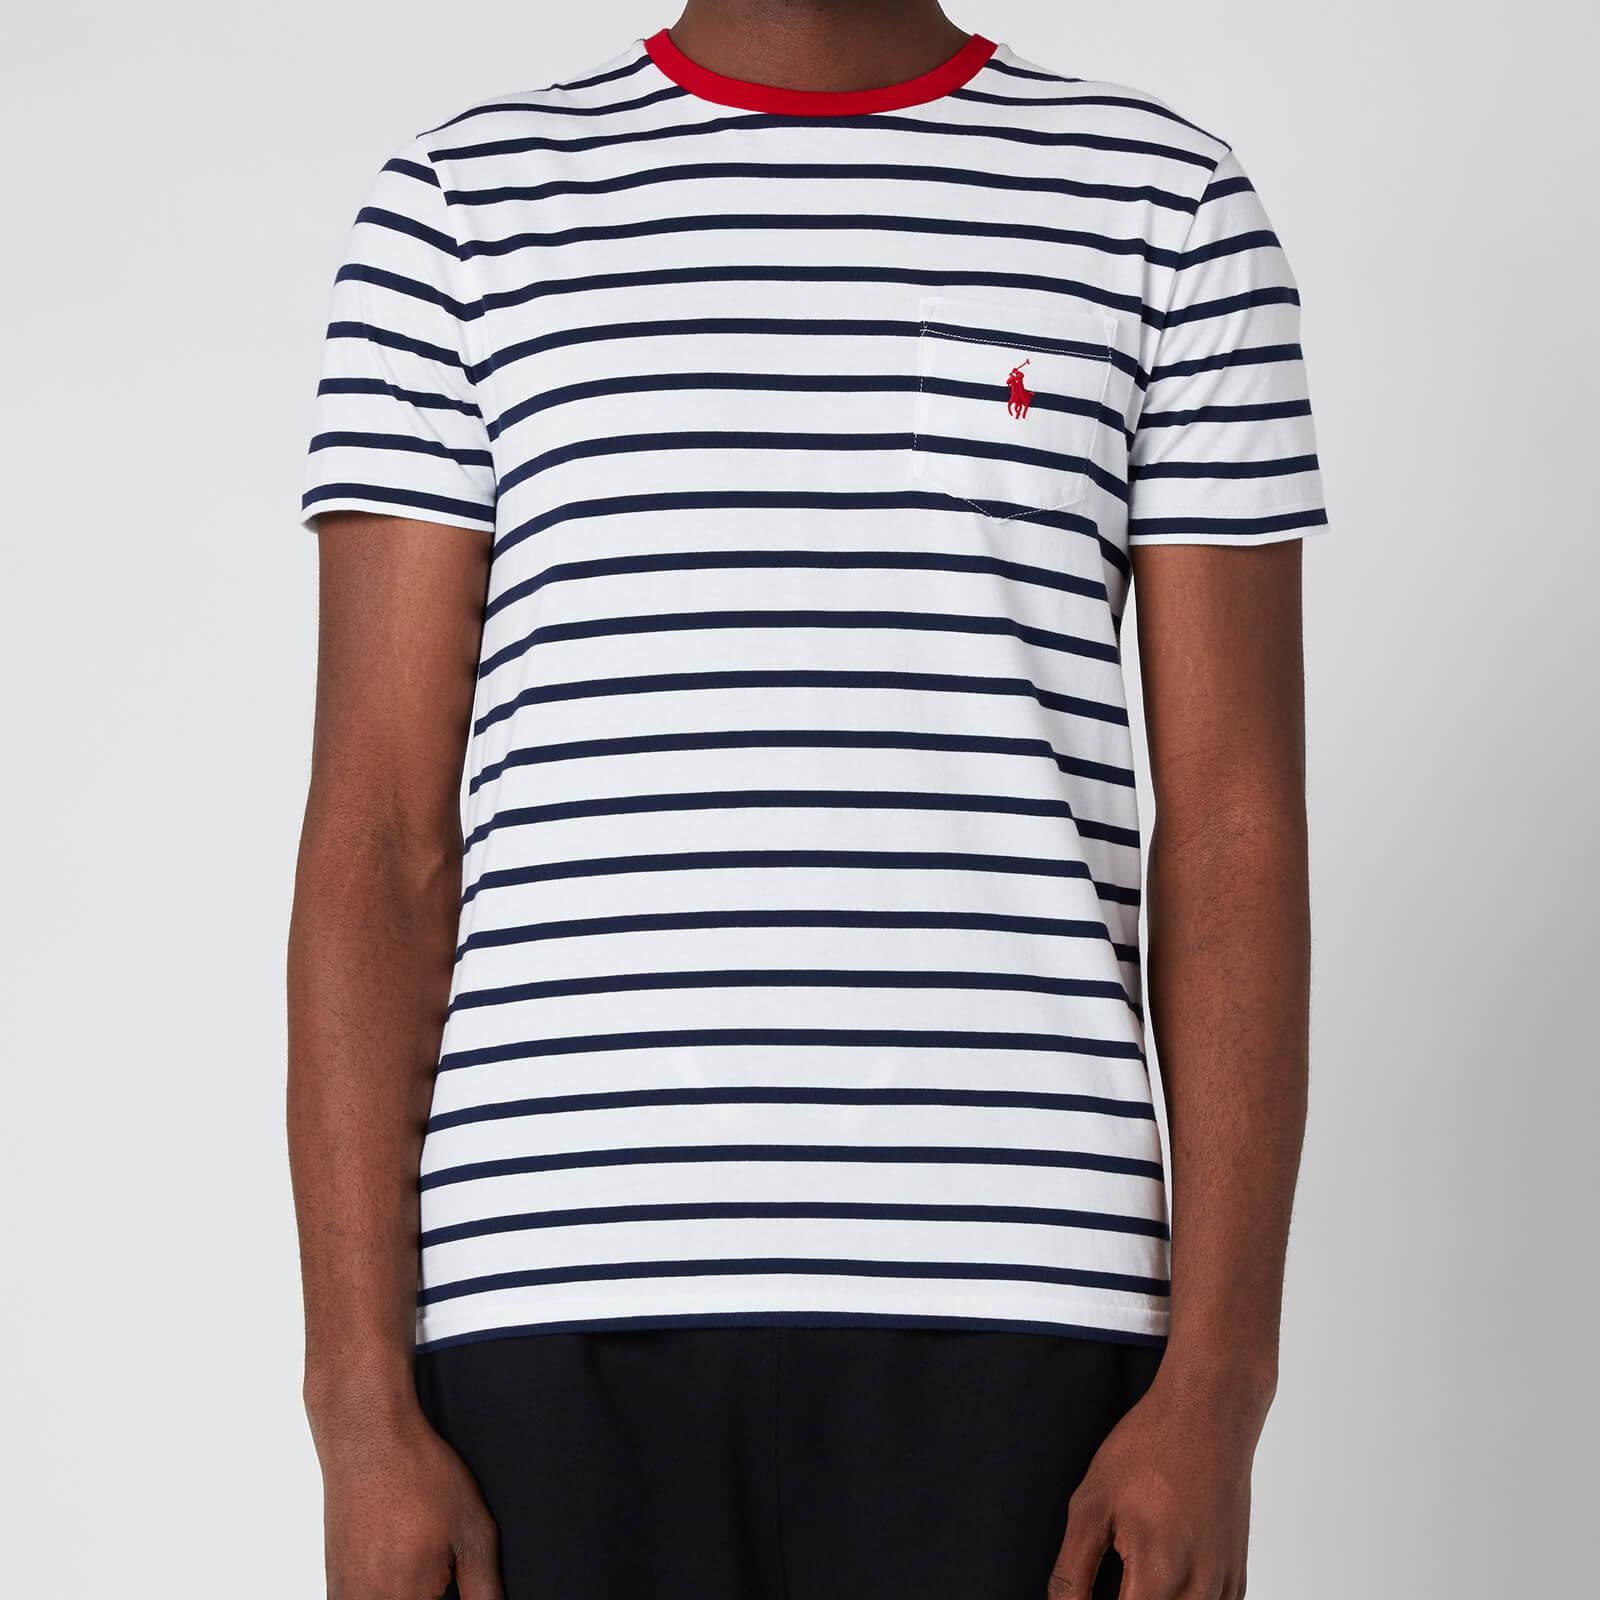 Polo Ralph Lauren Men's Striped Crewneck T-Shirt - White/French Navy - S